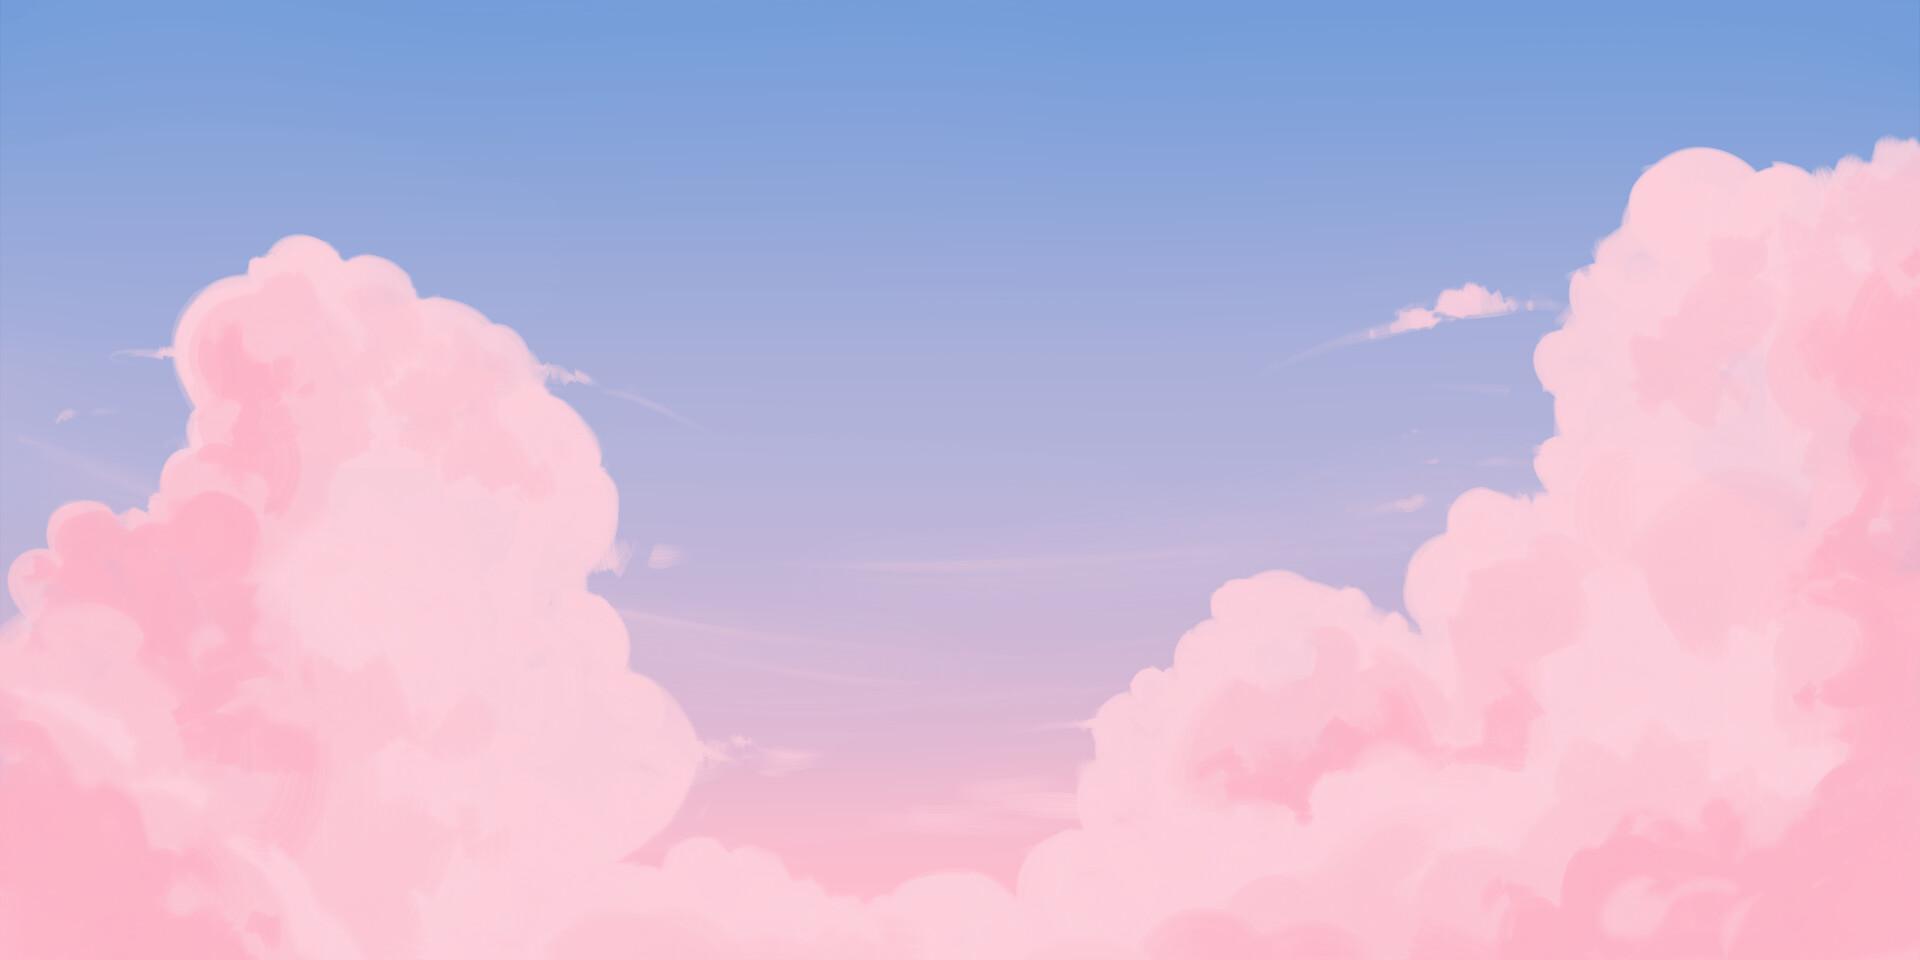 artstation simple clouds background stash angela jansen simple clouds background stash angela